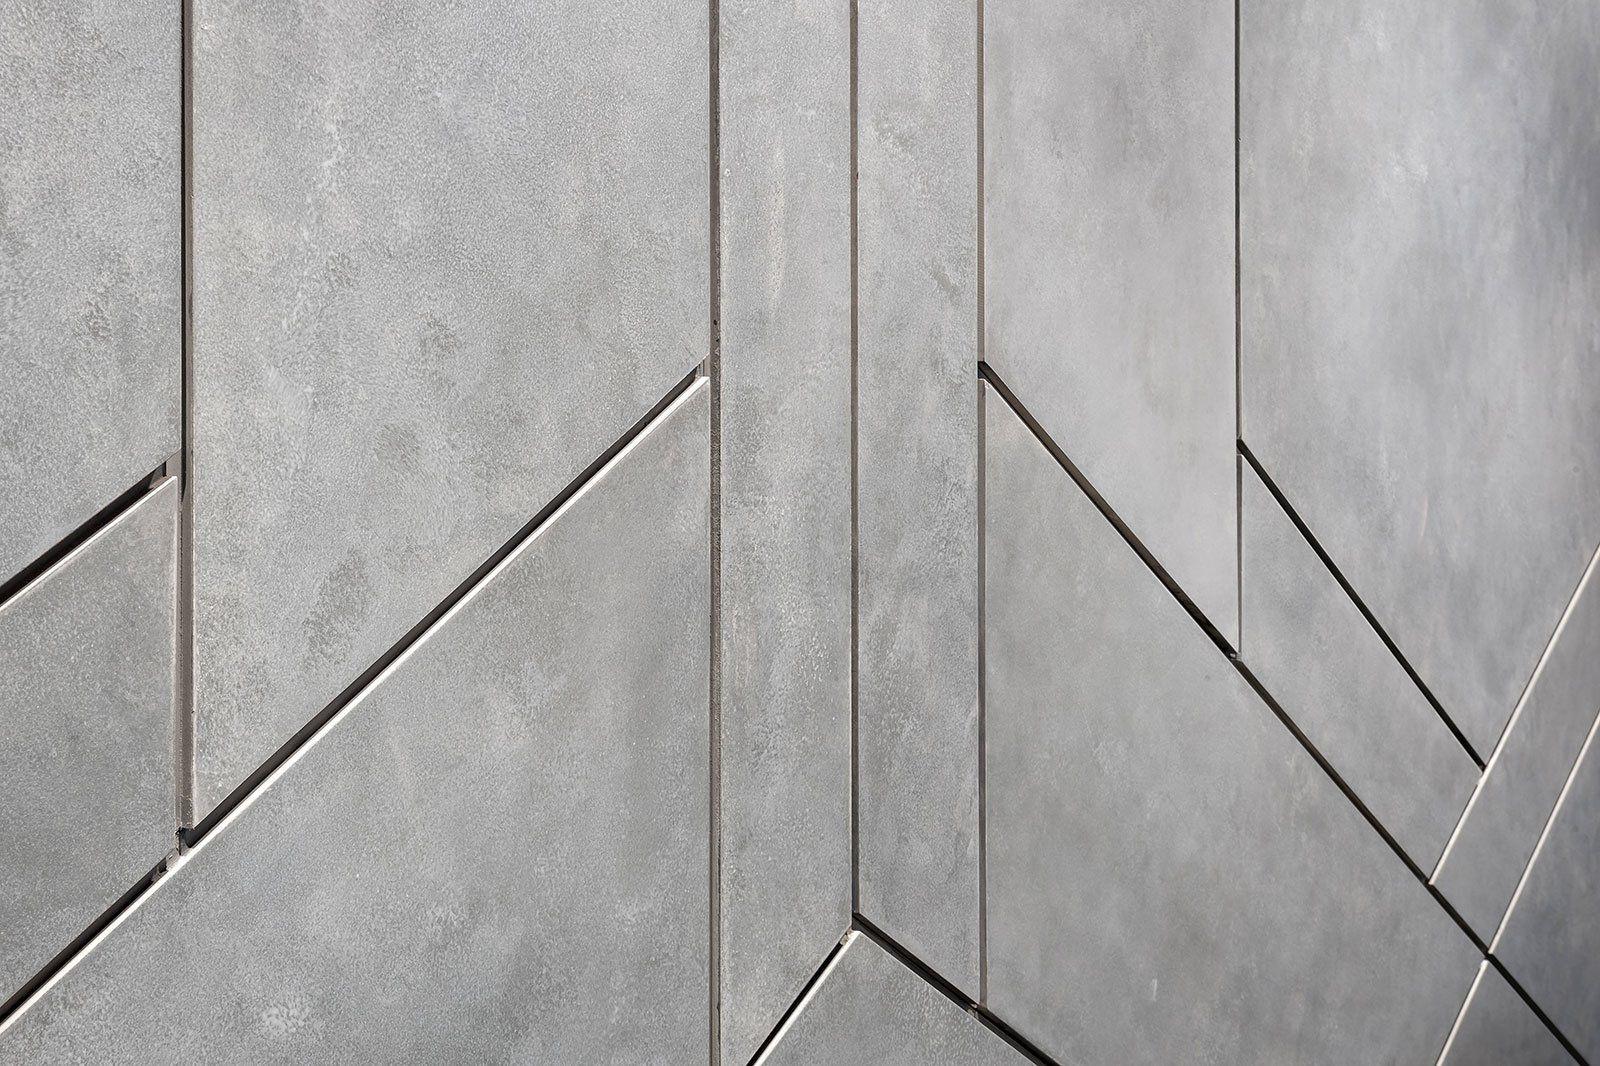 Wall By Artan Betonada Close Up Luxury Concreteart Architecture Concrete Architecture Art Craft Texture I Concrete Cover Concrete Wall Concrete Art